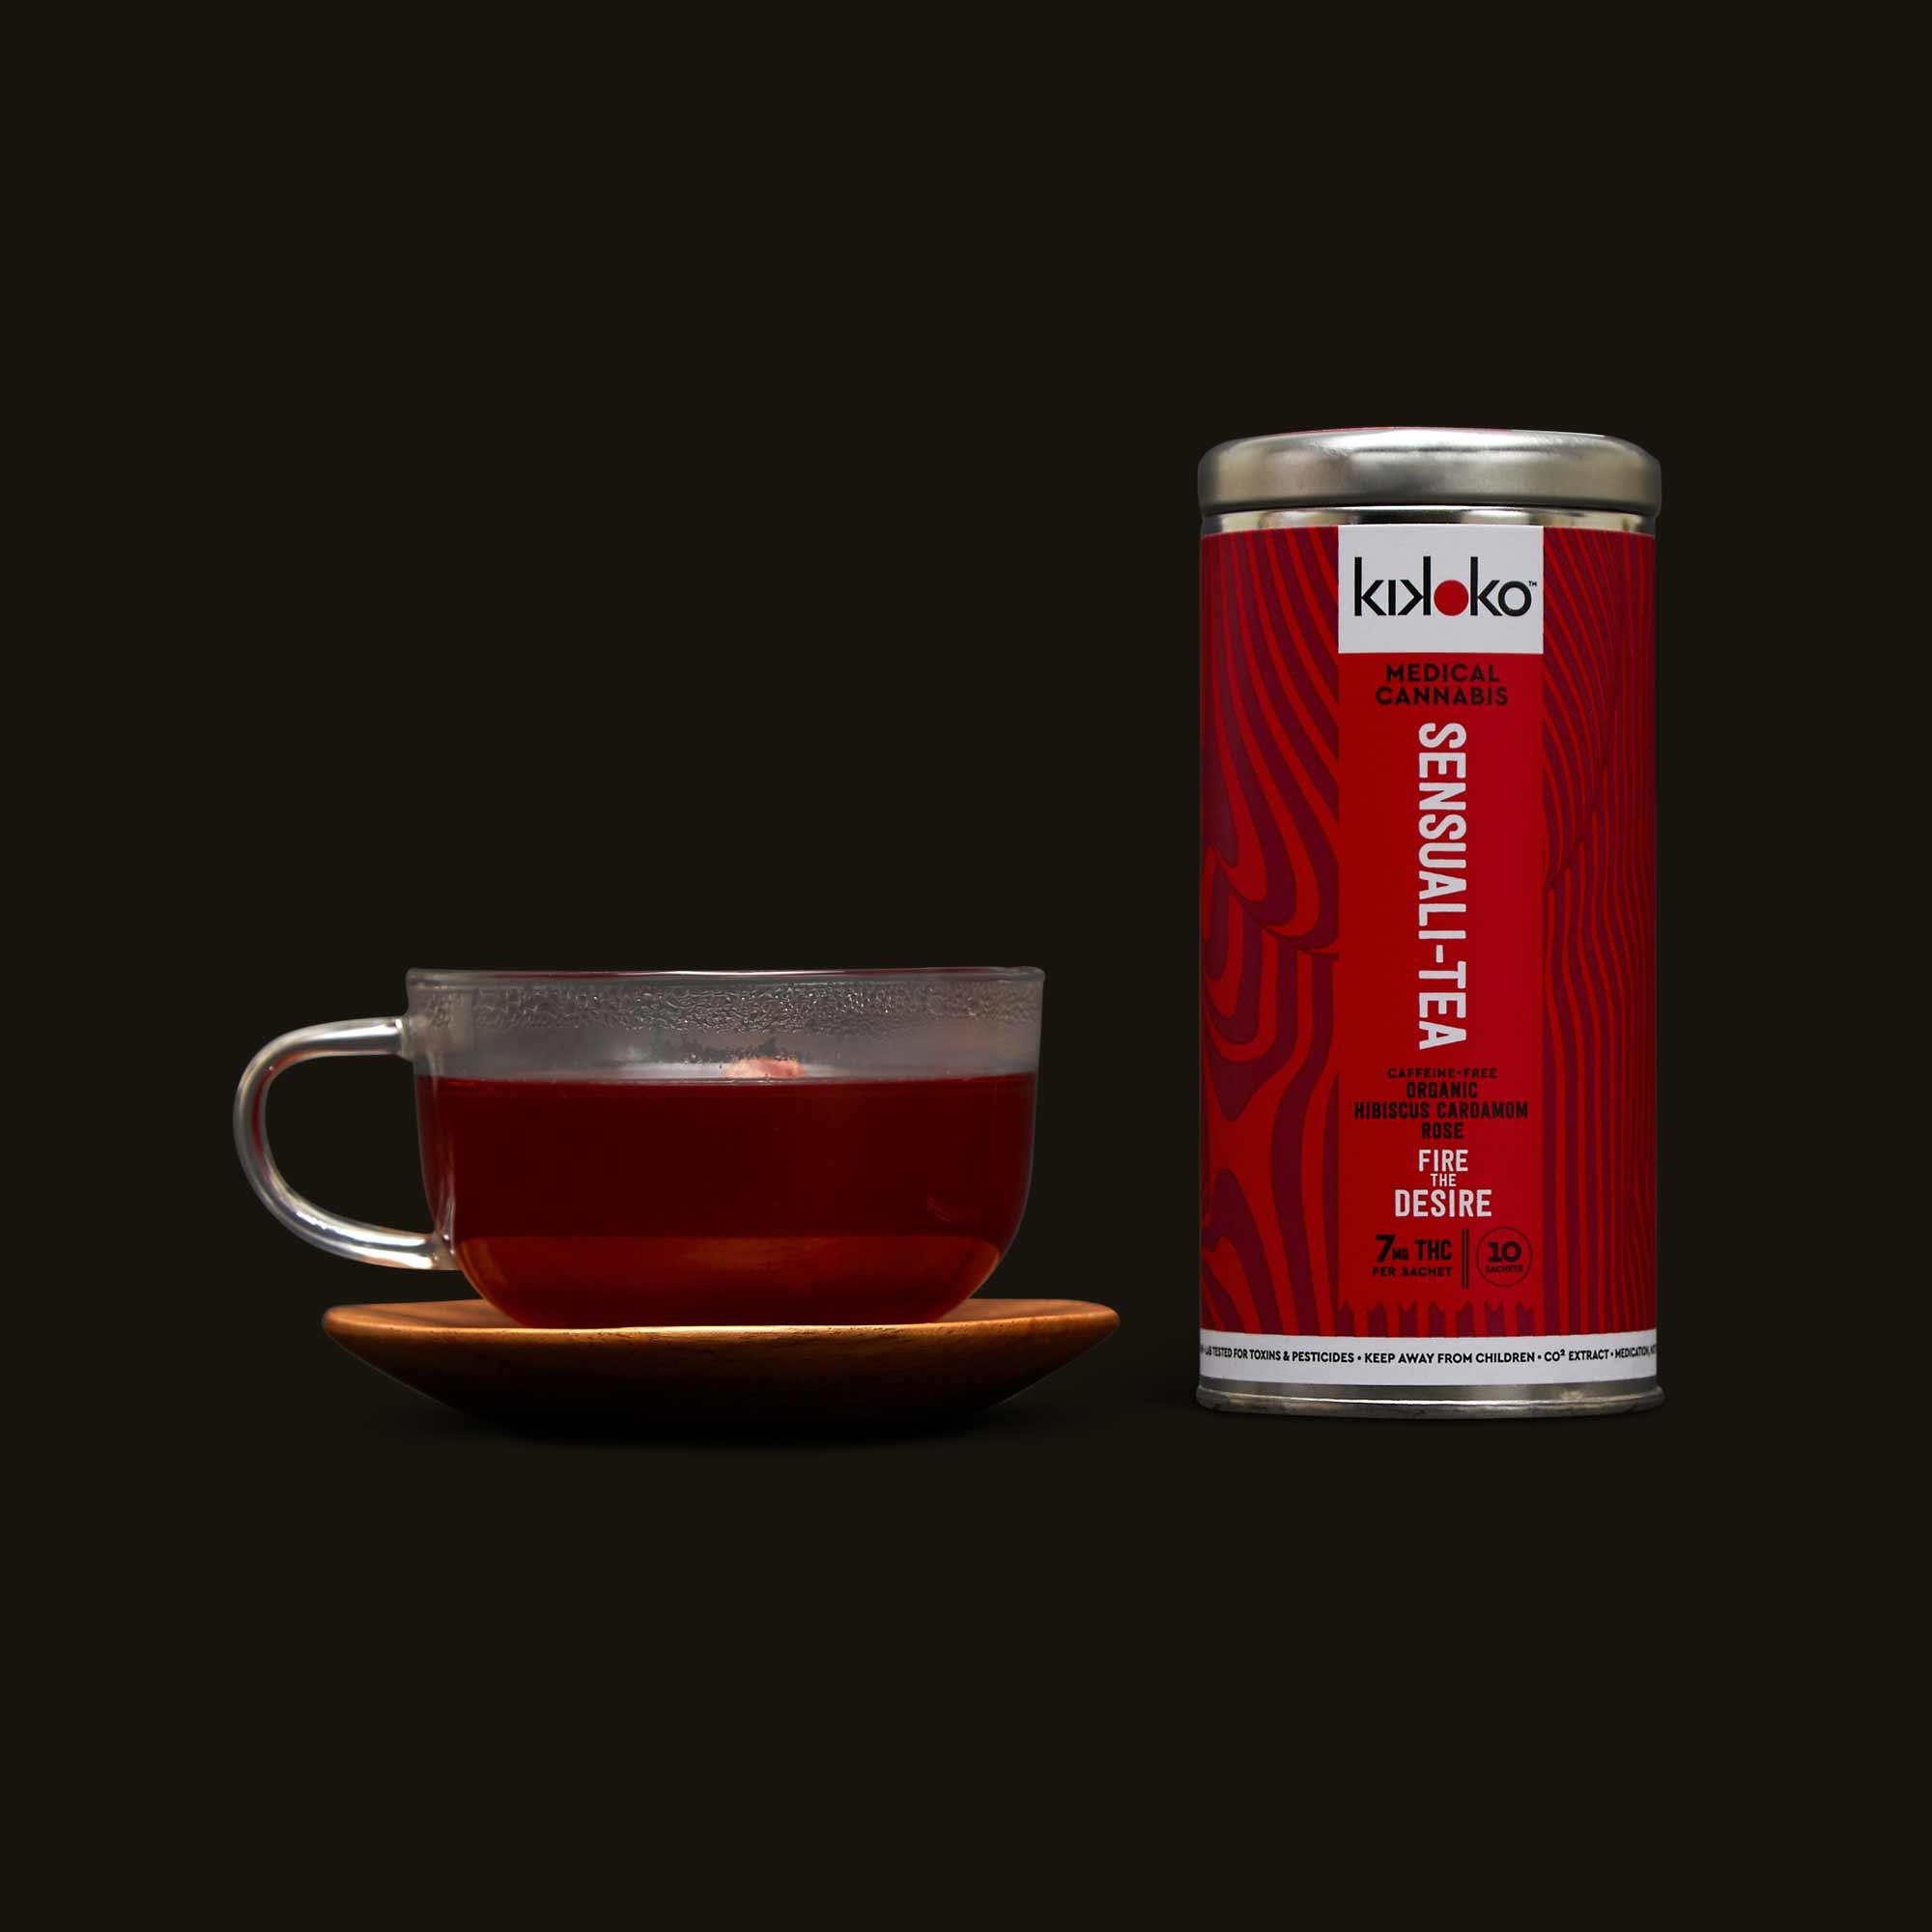 Glass cup of Kikoko Sensuali Tea